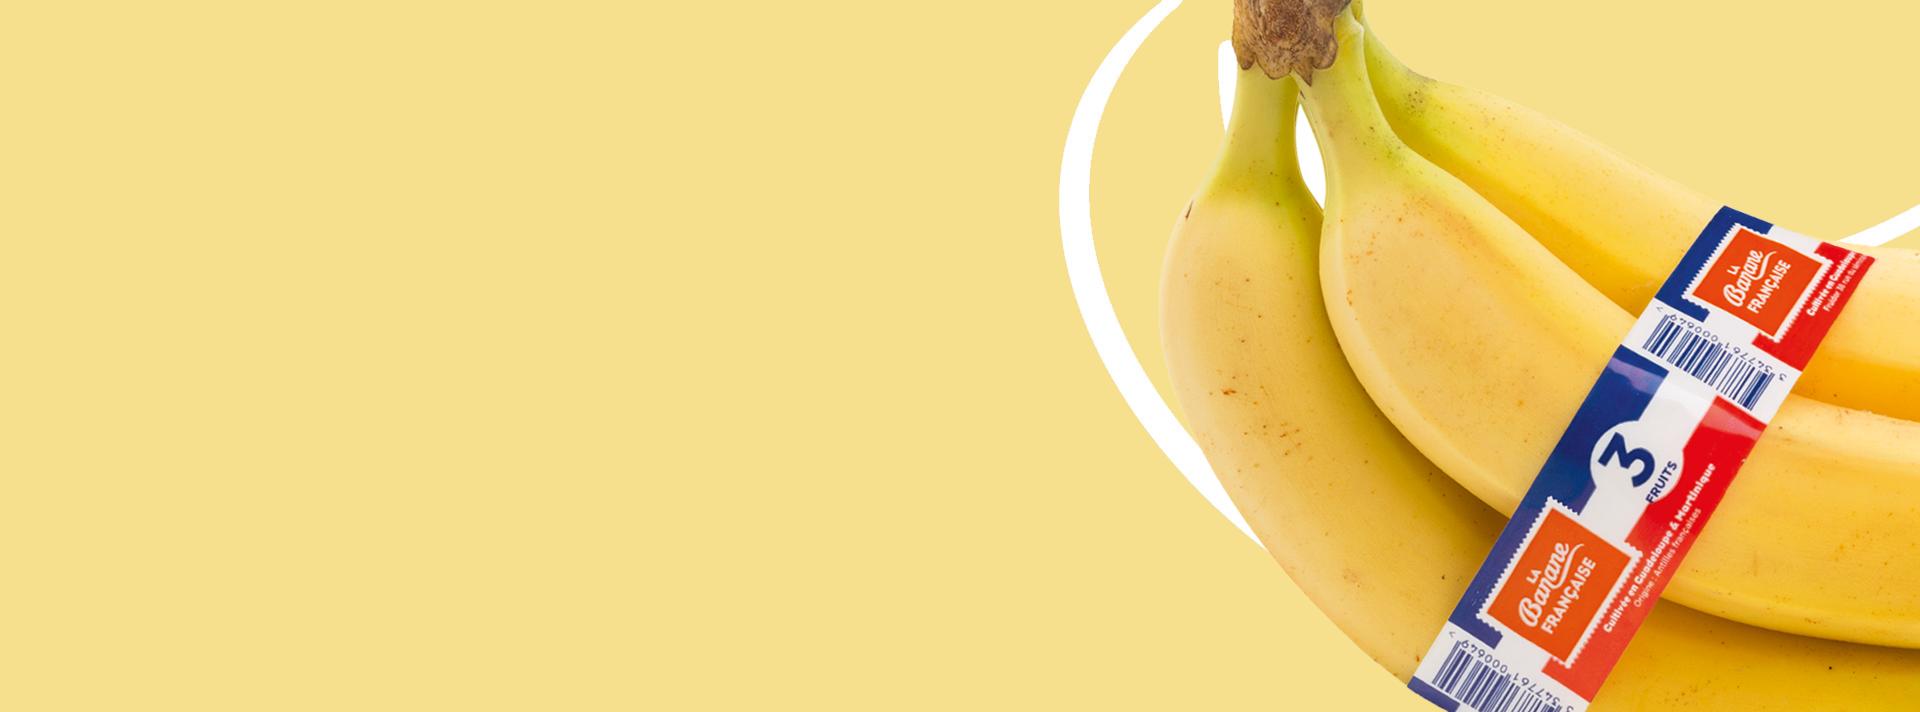 banane-LBF-desktop-2